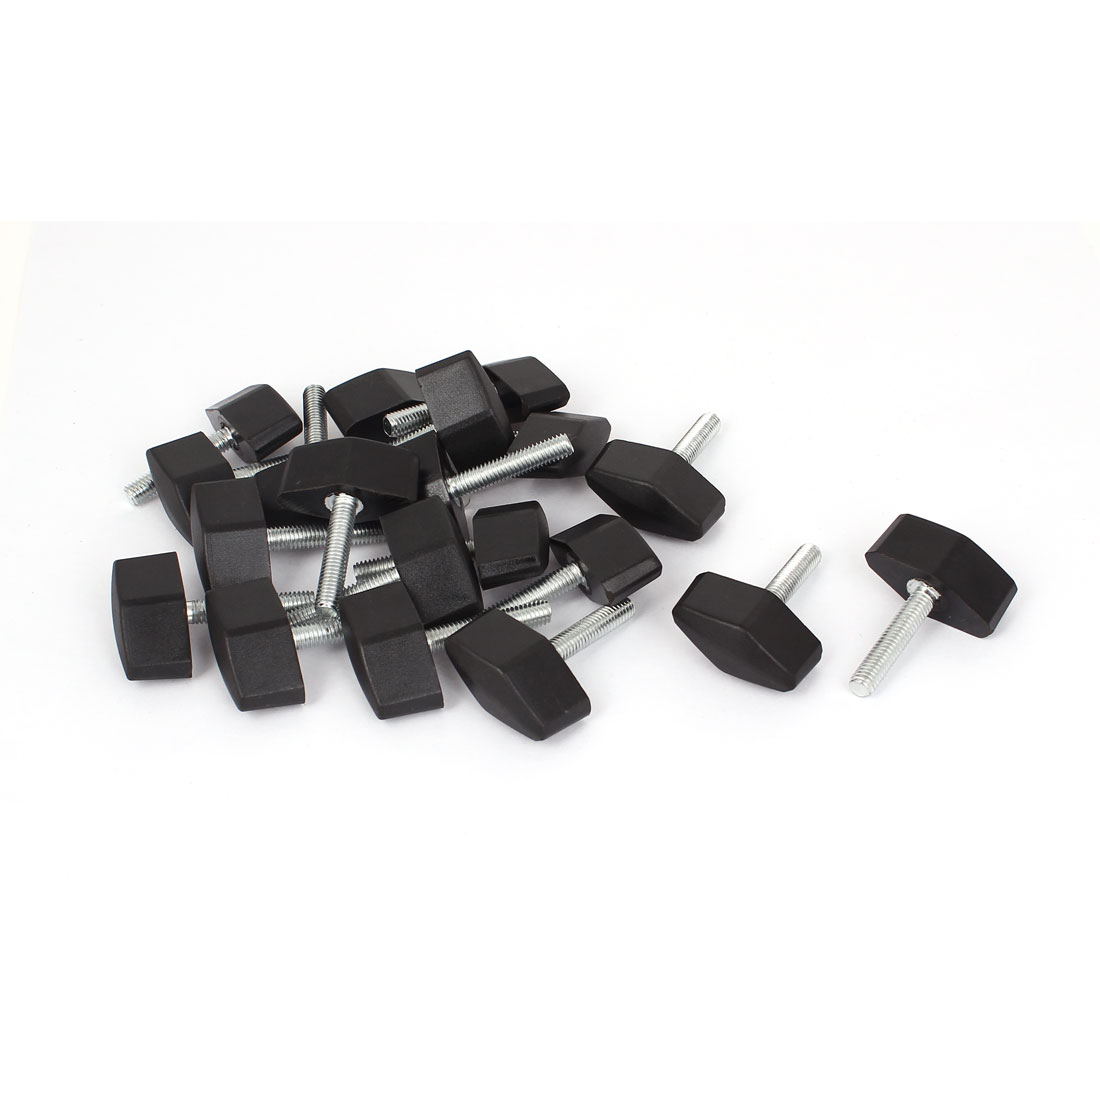 M6 x 30mm Thread Screw Rotating Adjustable Clamping Handle Knob 20 Pcs